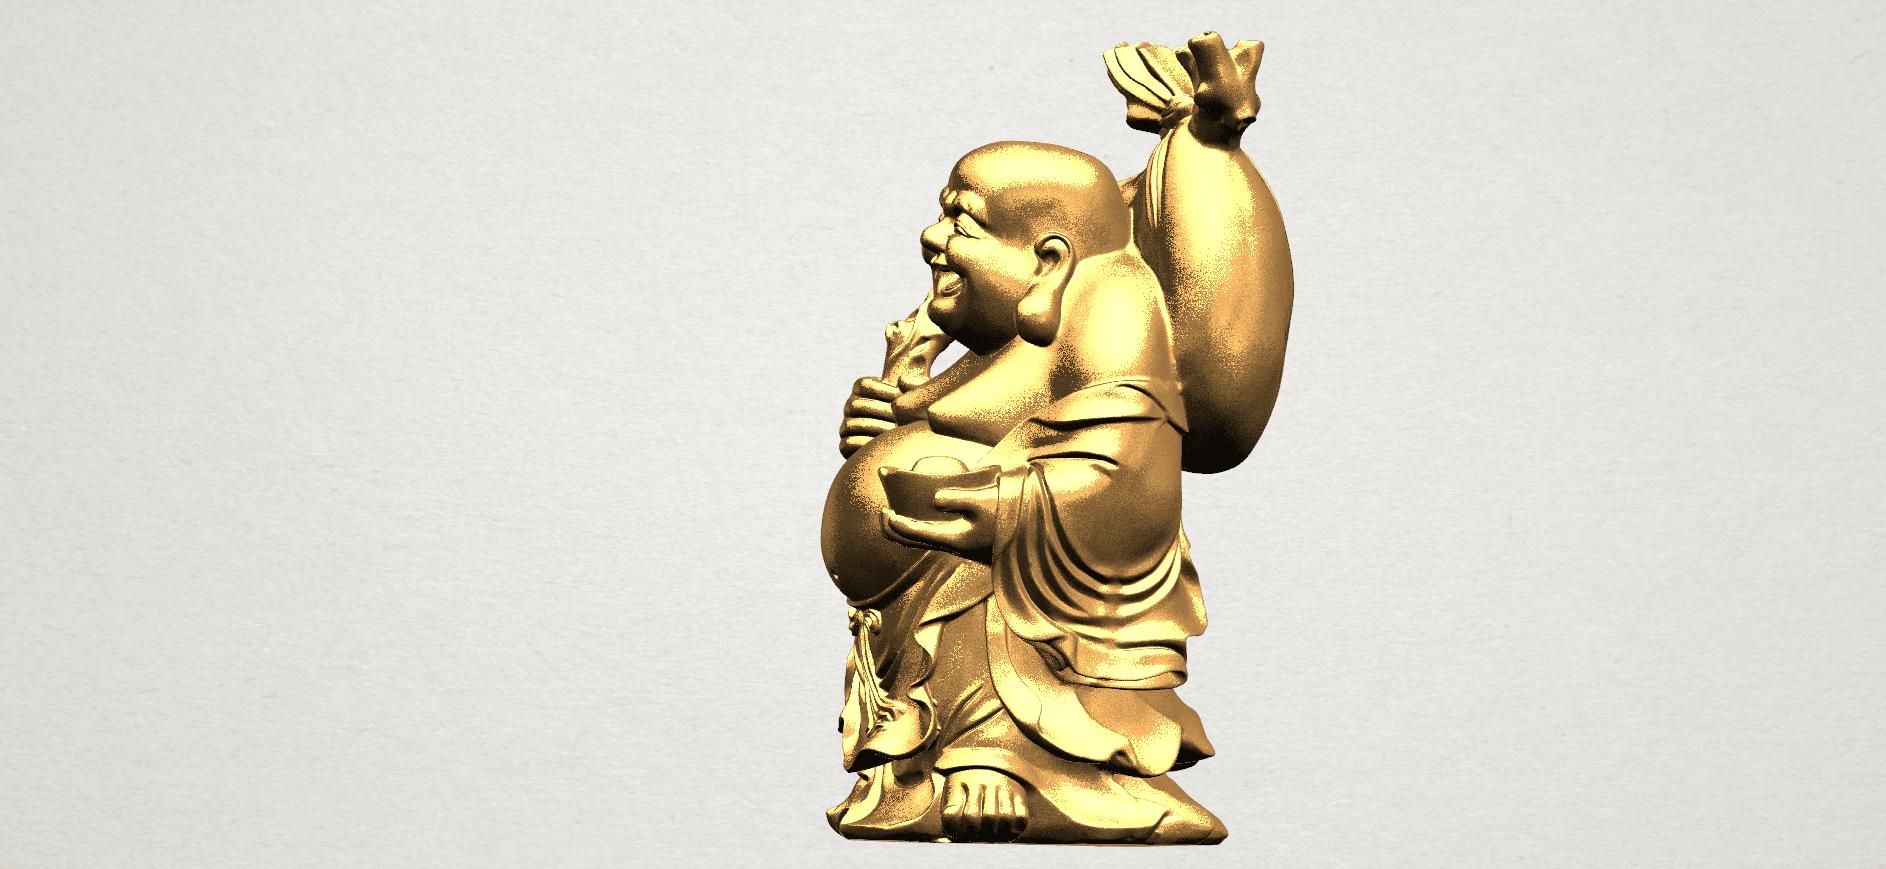 Metteyya Buddha 05 - 88mm - A03.png Télécharger fichier STL gratuit Bouddha Metteyya 05 • Objet imprimable en 3D, GeorgesNikkei